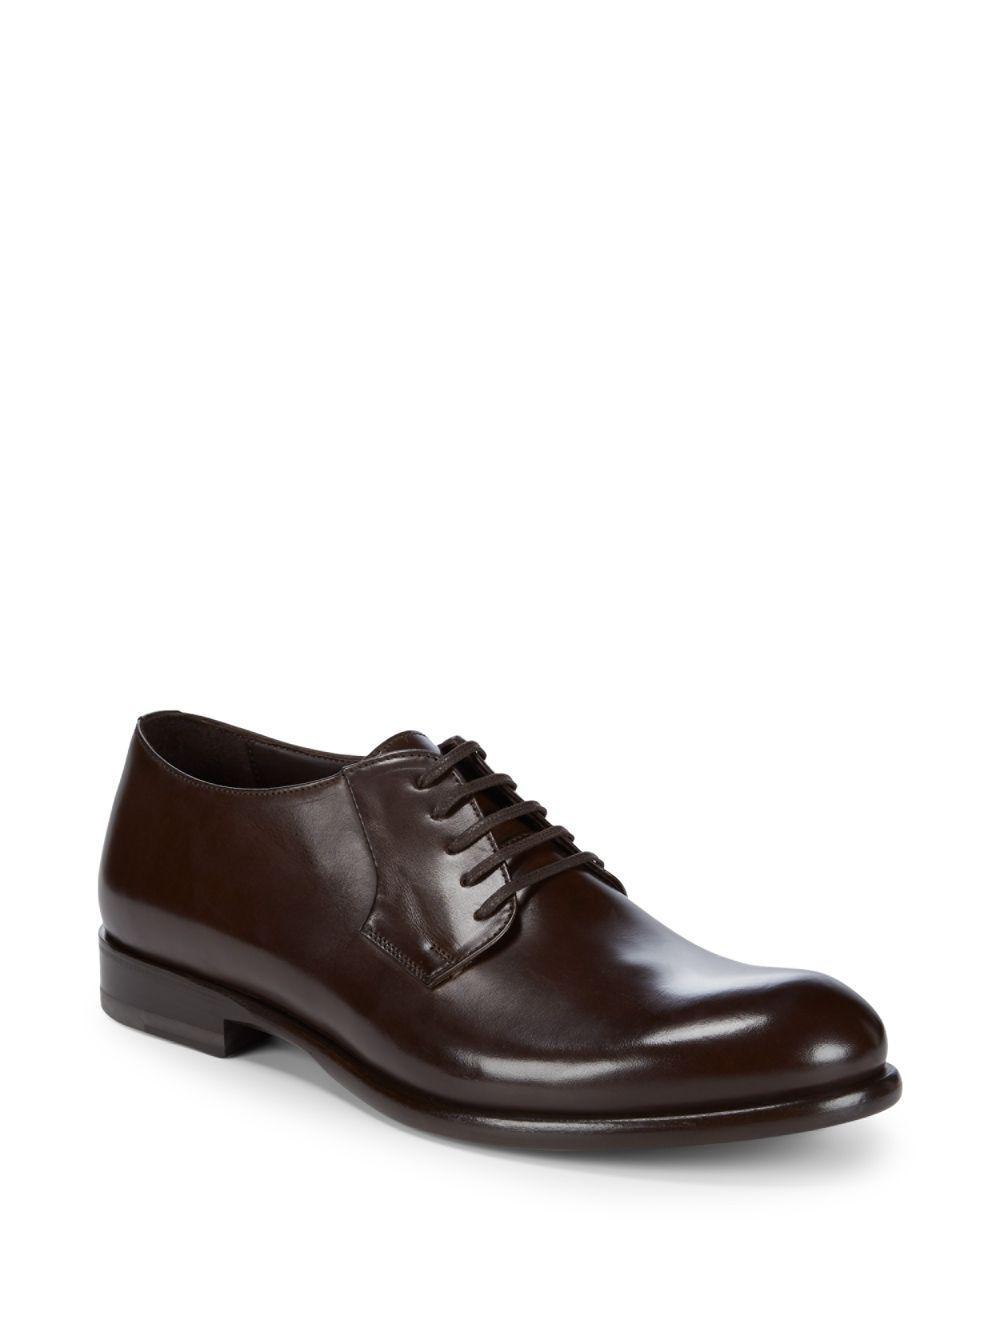 Men's Almeria Leather Off-Center Lace-Up Dress Shoes bi9ILUhQ2U